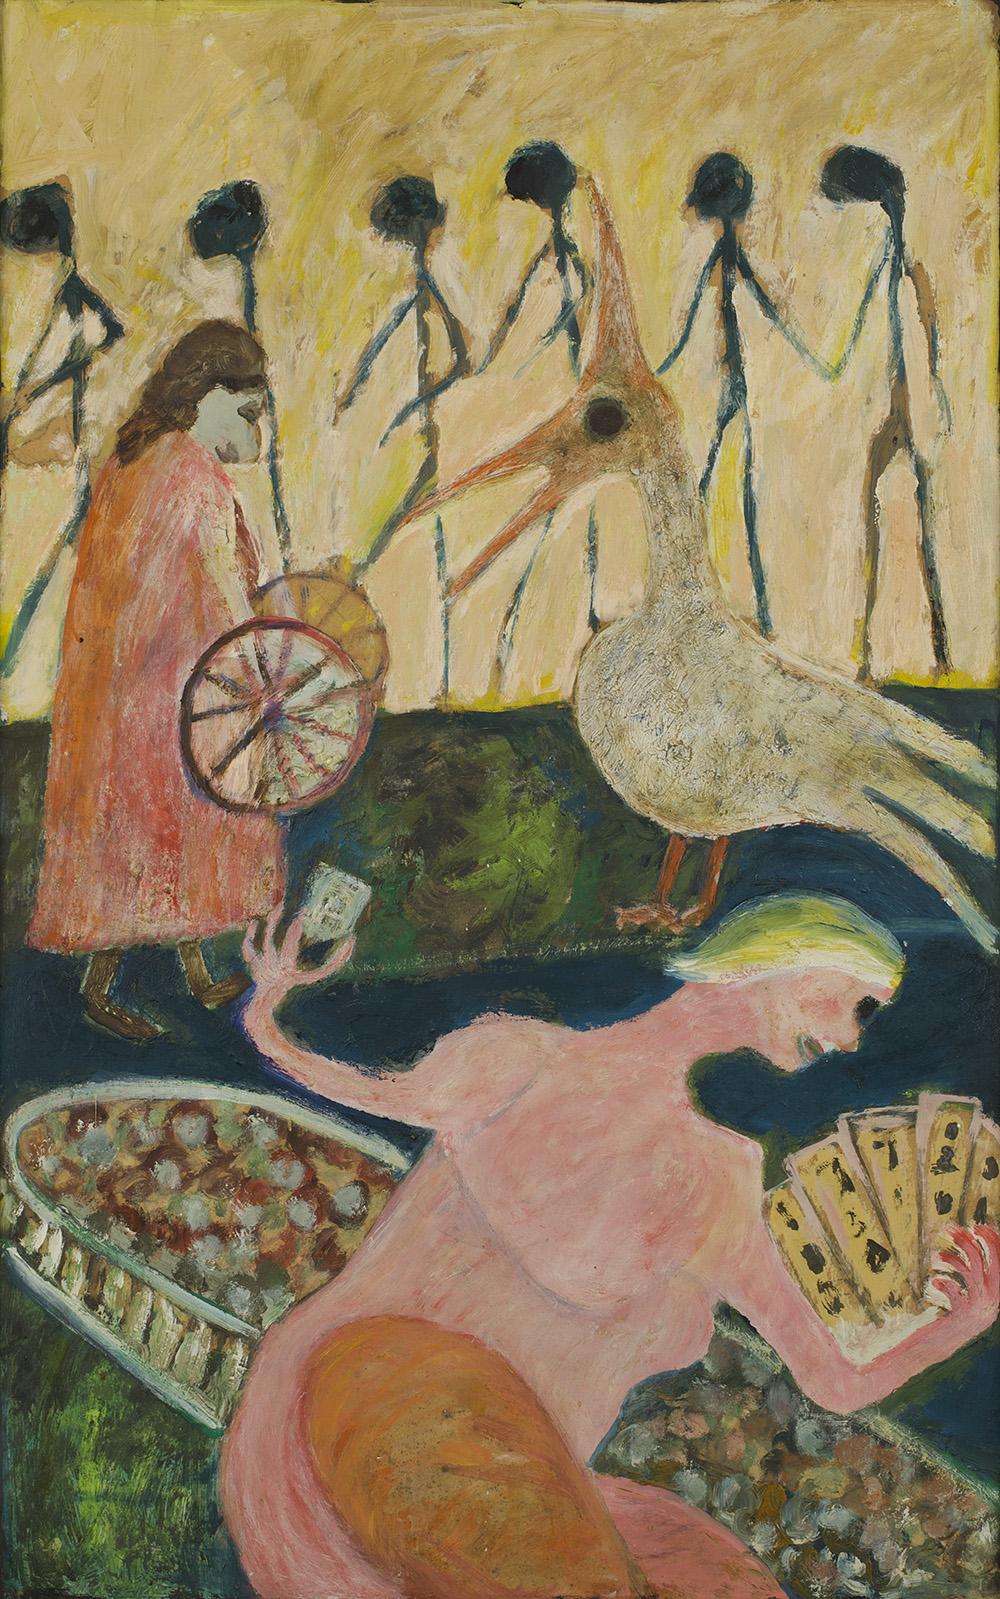 Jon Serl    Procession  , n.d. Oil on canvas 33 x 20 inches 83.8 x 50.8 cm SJ 492